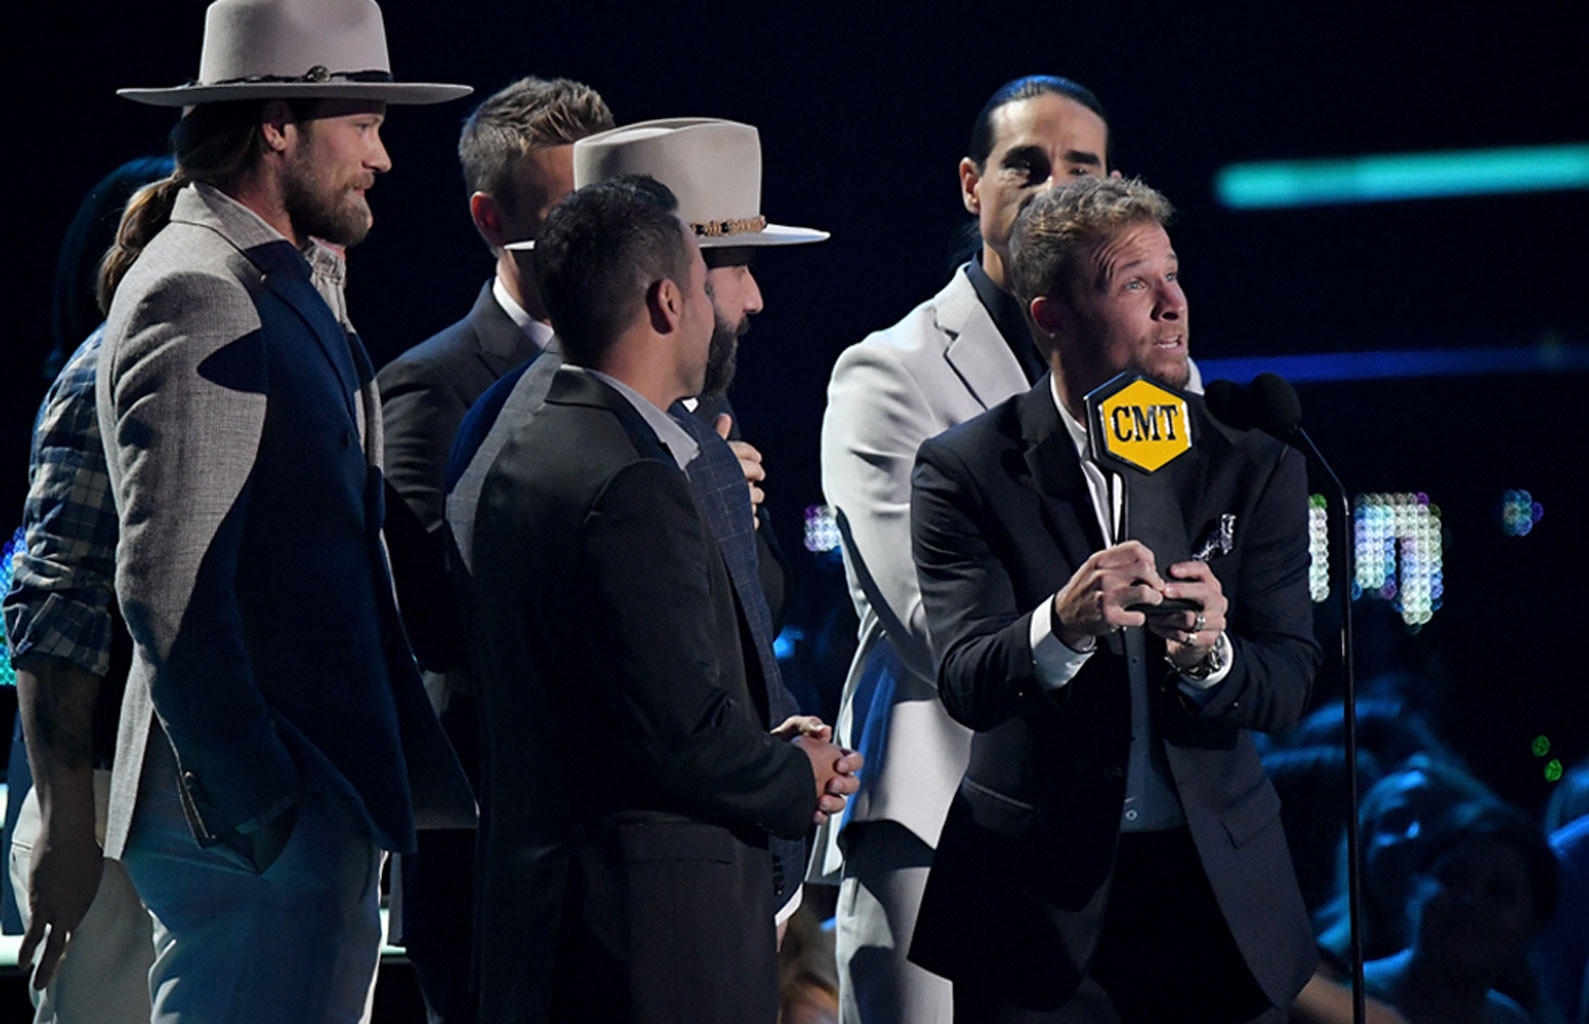 Florida Georgia Line, The Backstreet Boys, Winners, 2018 CMT Awards